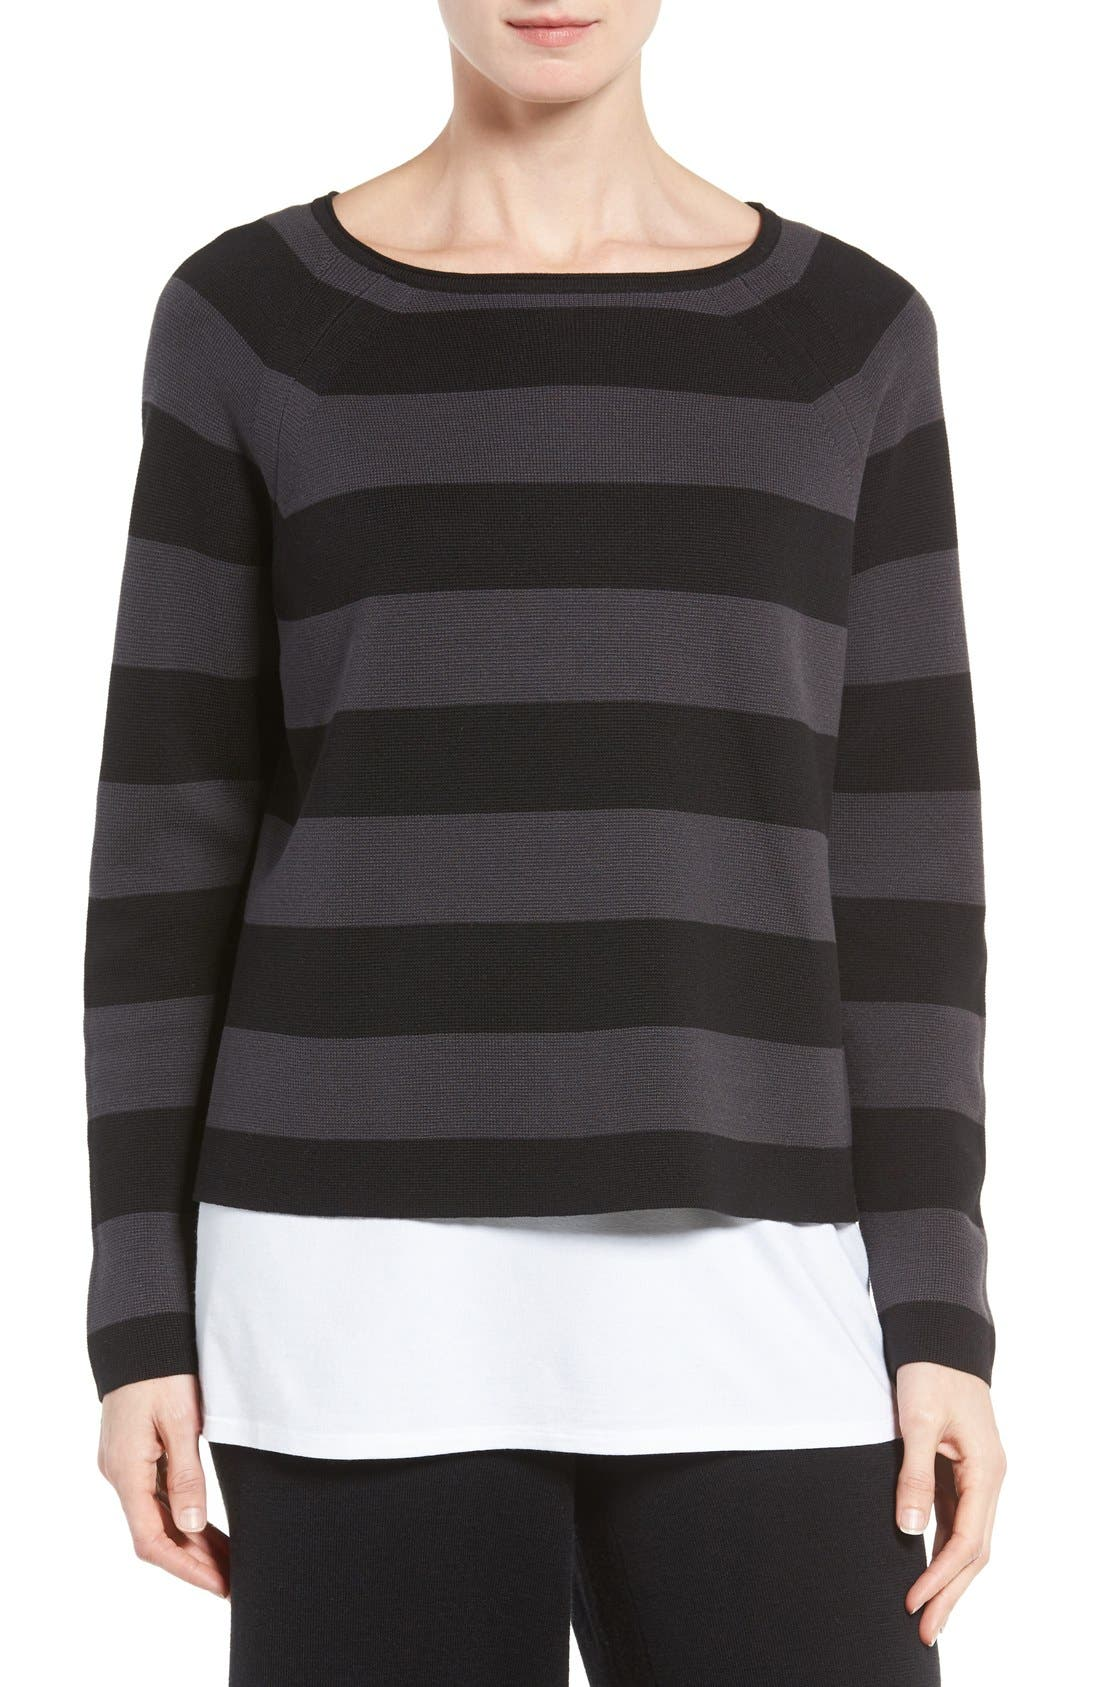 Alternate Image 1 Selected - Eileen Fisher Crop Silk & Organic Cotton Top (Regular & Petite)